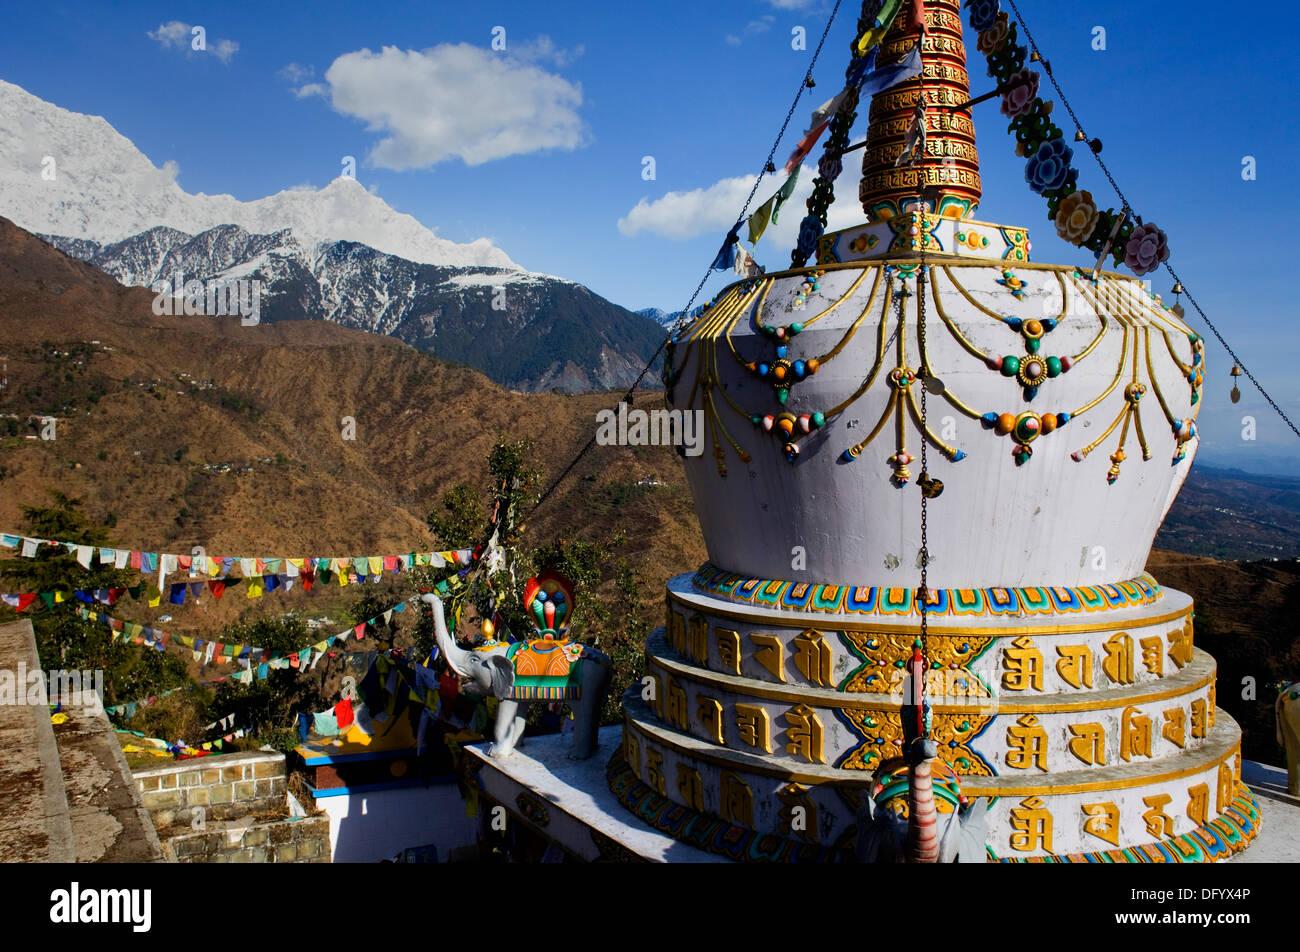 Stupa in Lhagyal Ri,near Tsuglagkhang complex.In background the Himalaya mountains.McLeod Ganj, Dharamsala, Himachal Pradesh - Stock Image